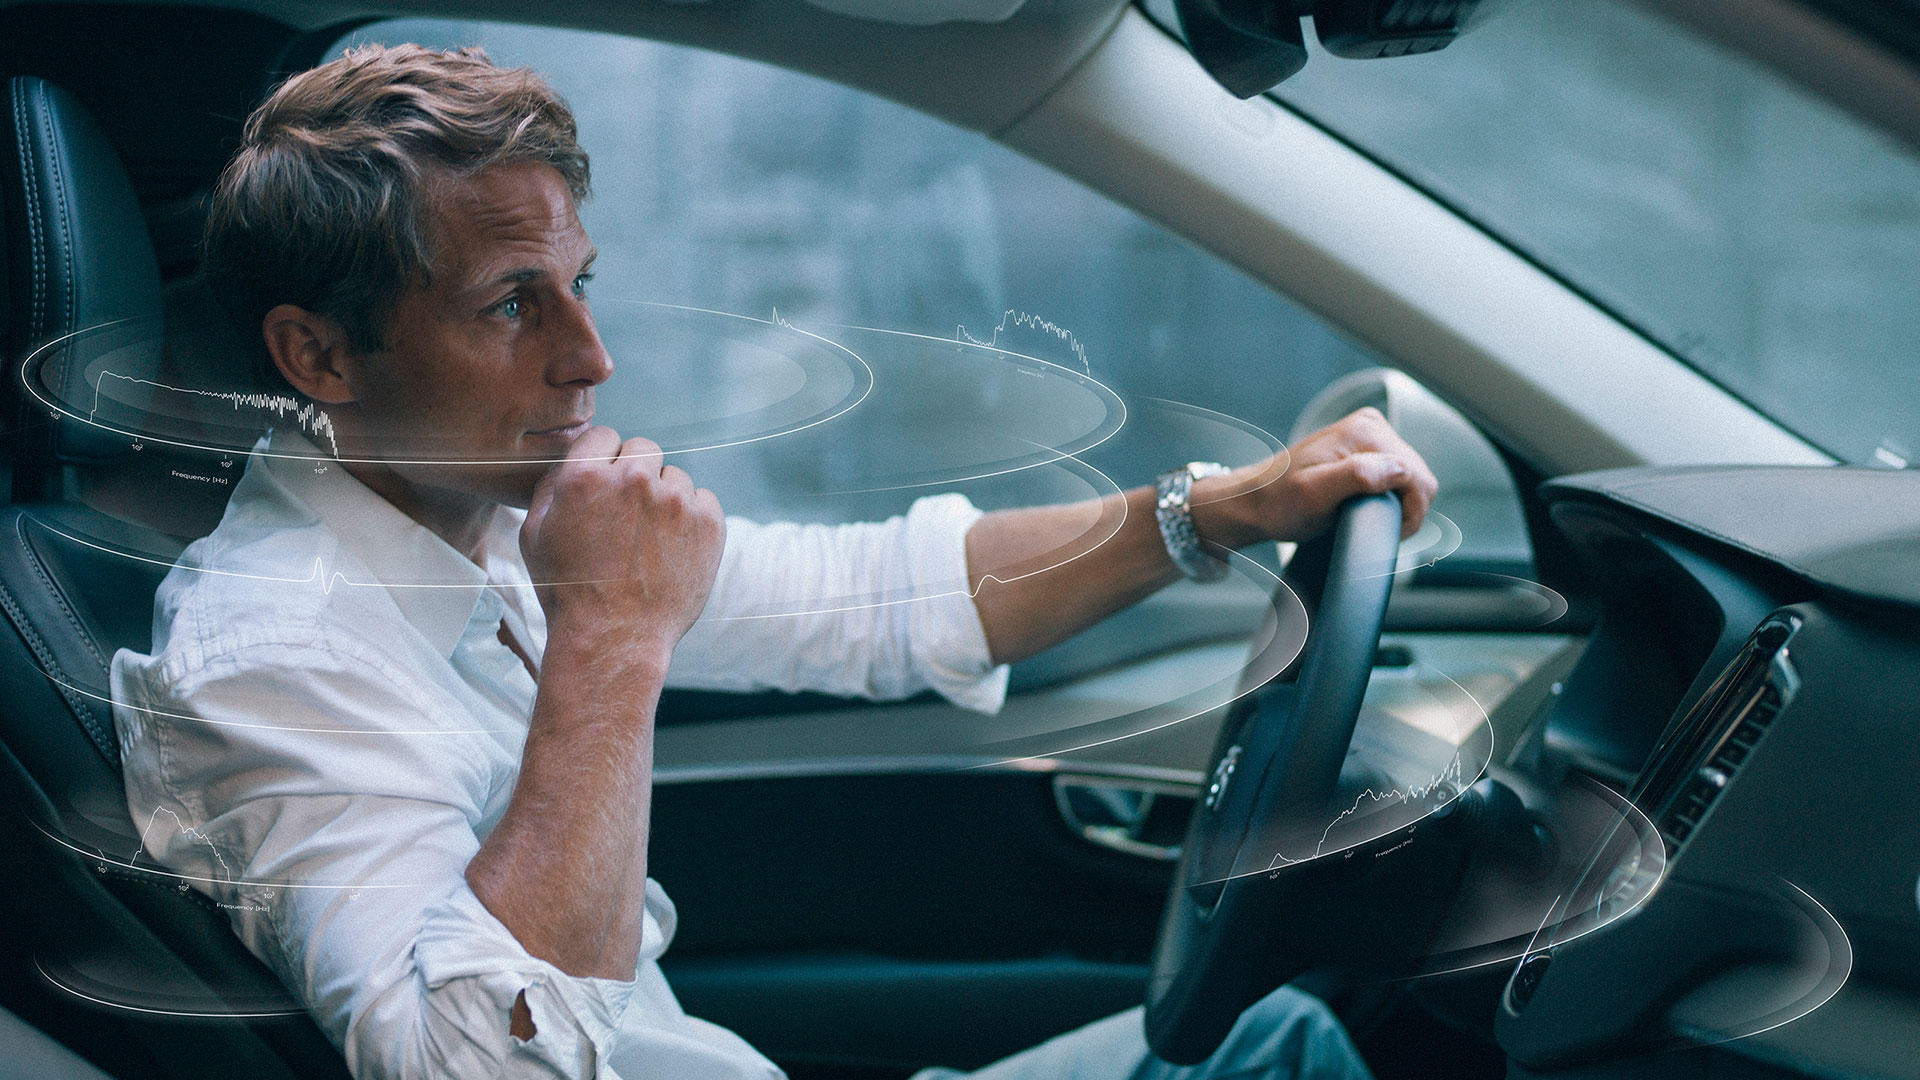 Image of man in car